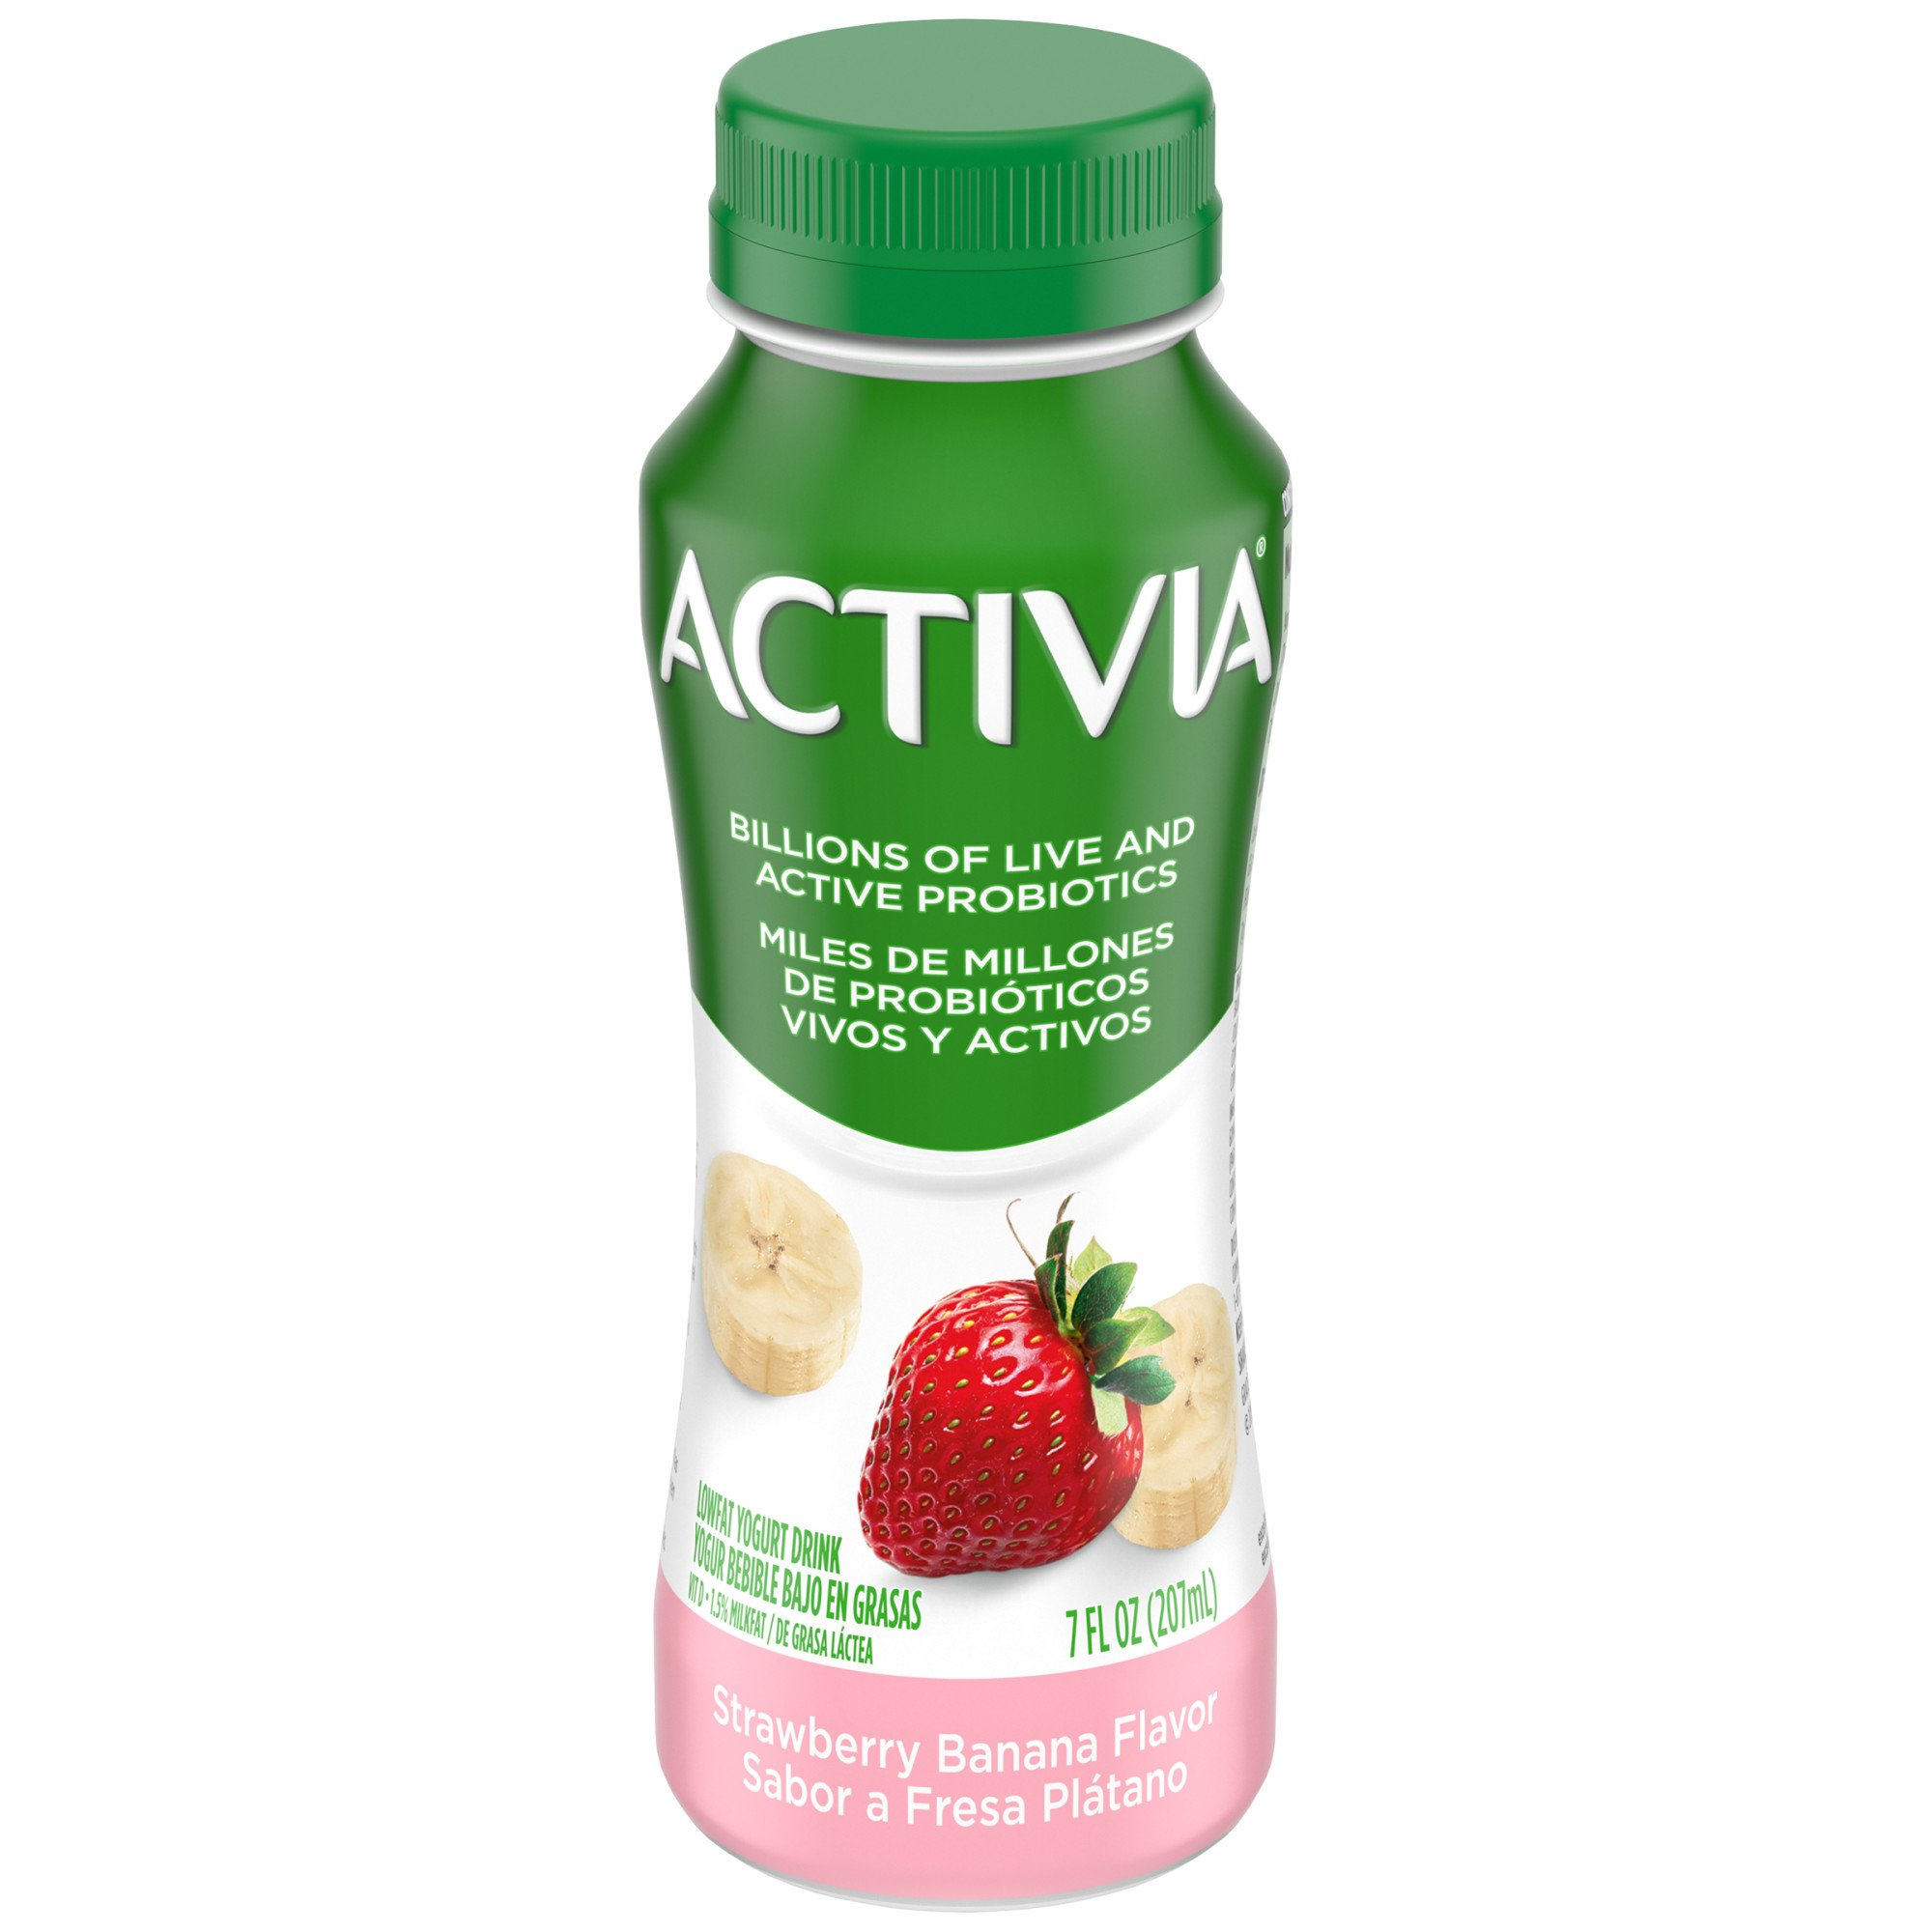 Dannon Activia Strawberry Banana